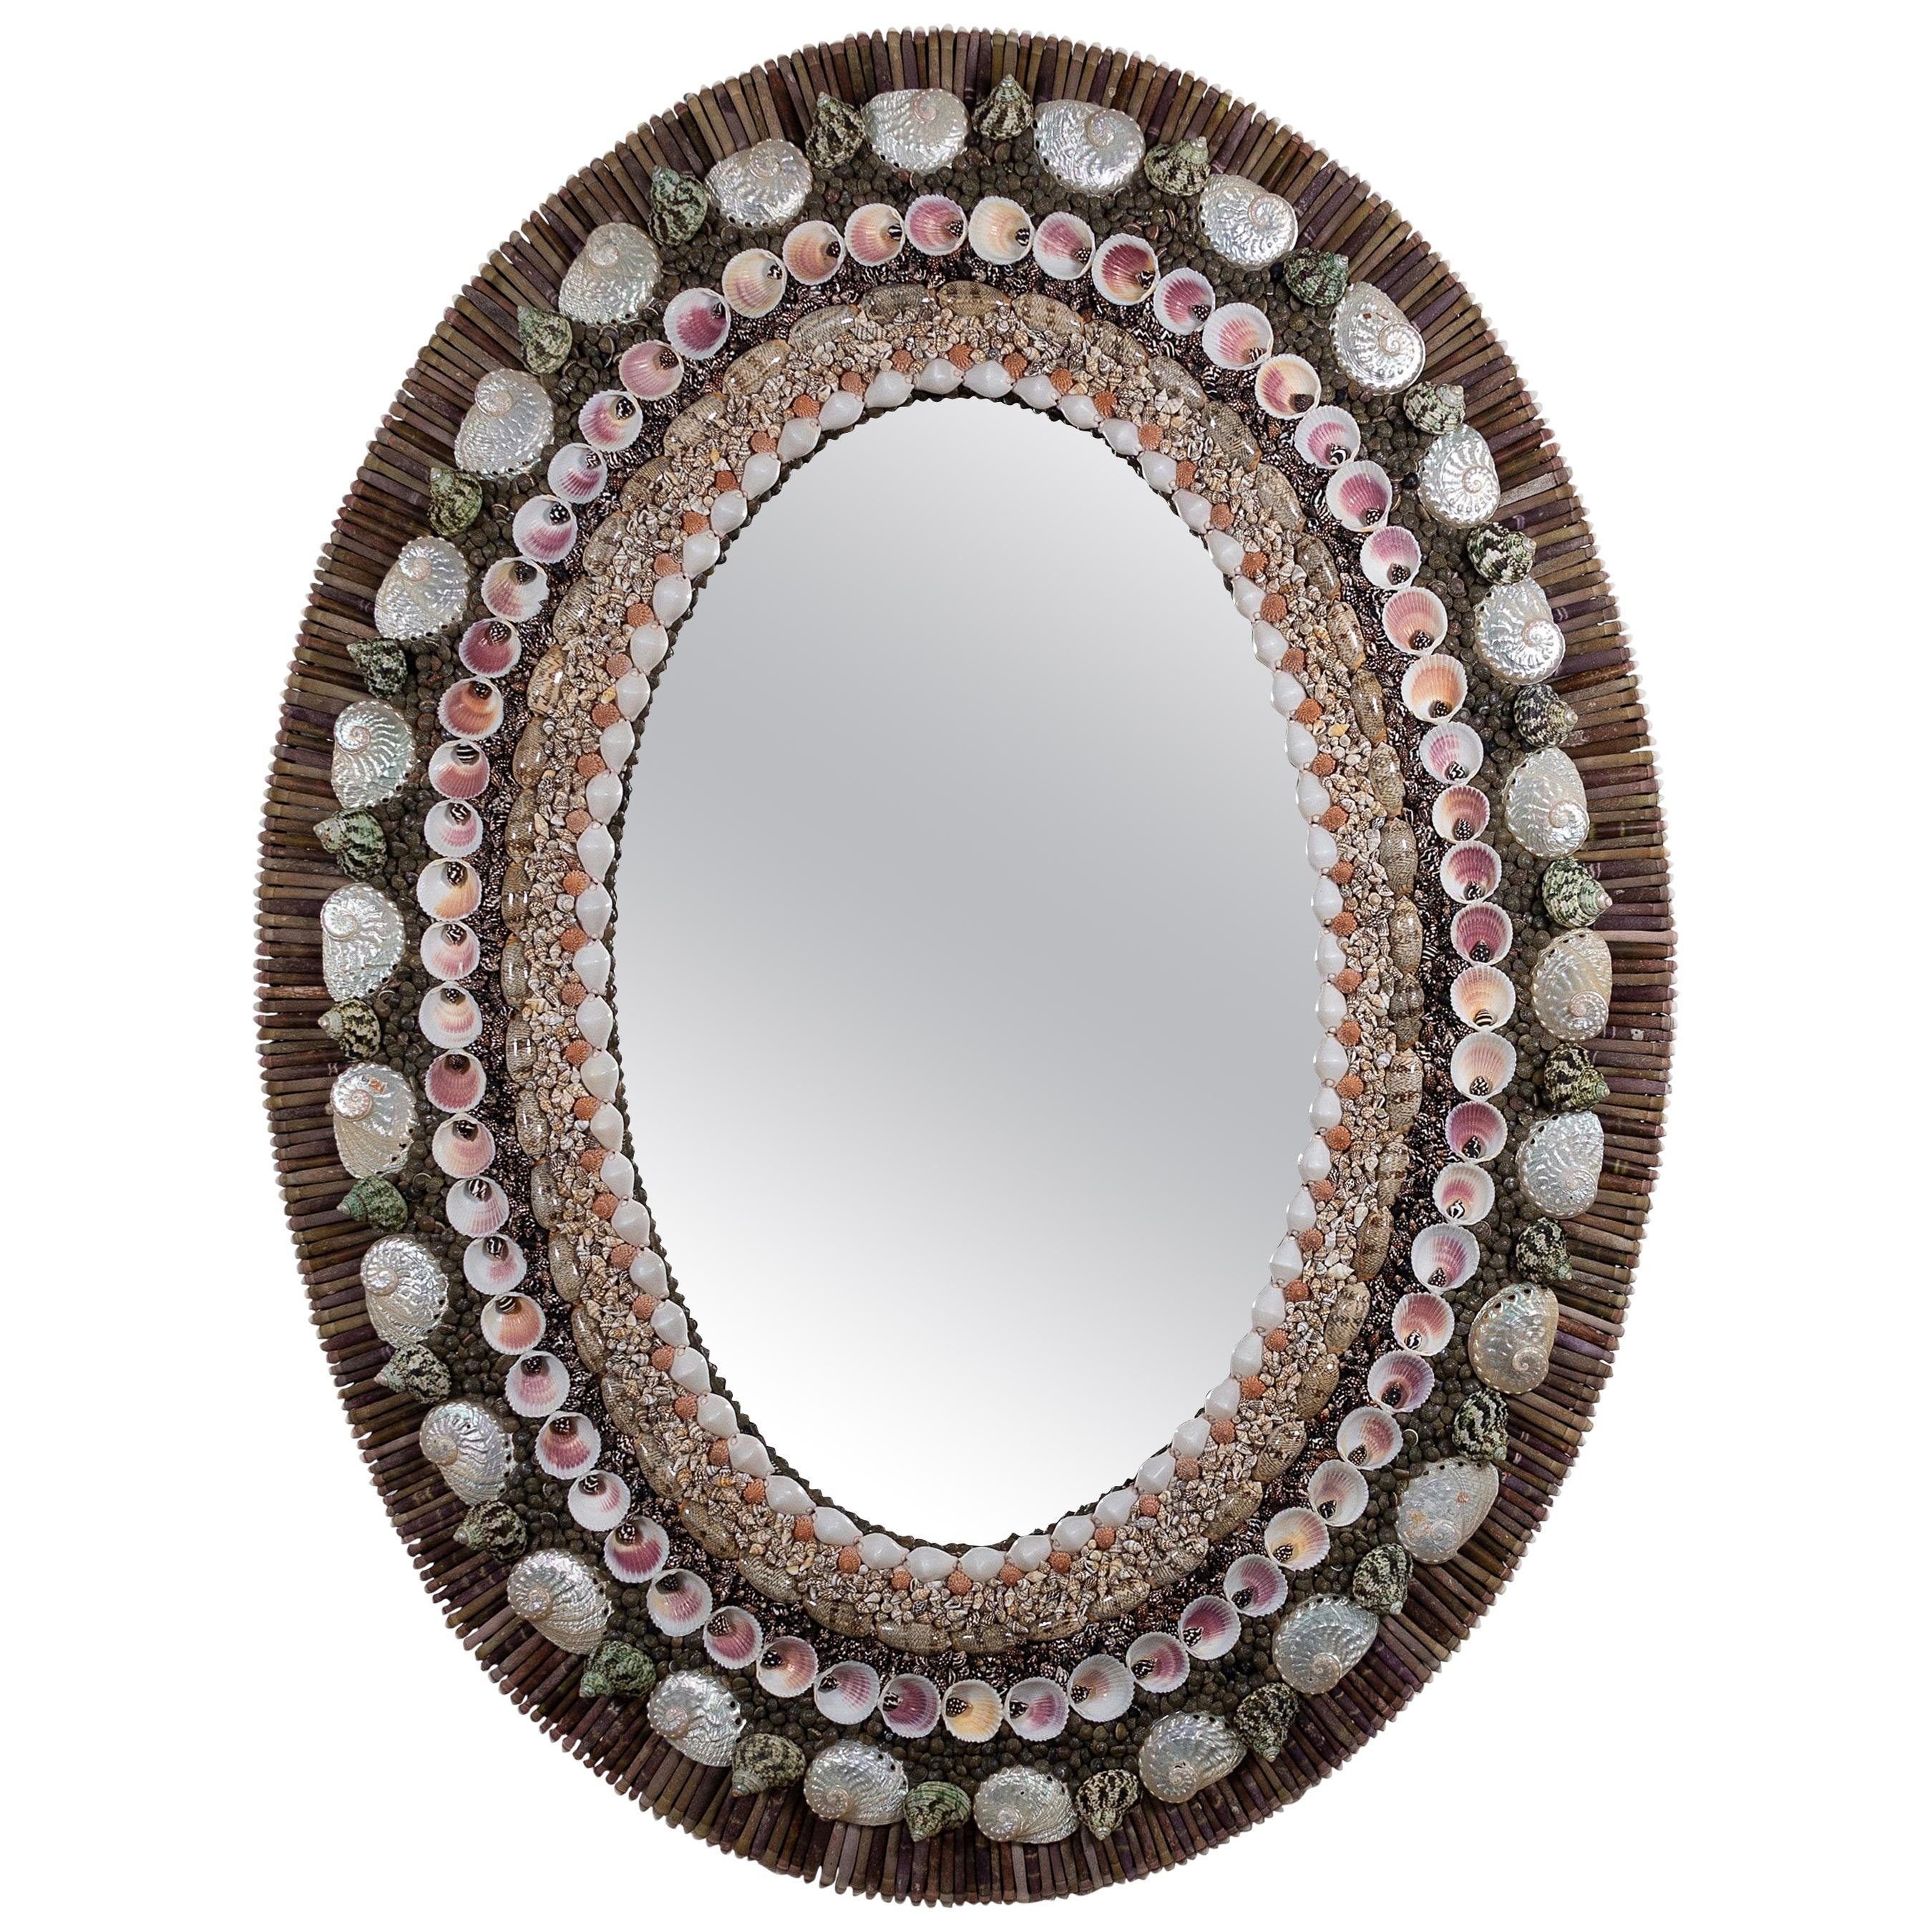 Oval Decisions, Unique Shell Mirror by Shellman Scandinavia